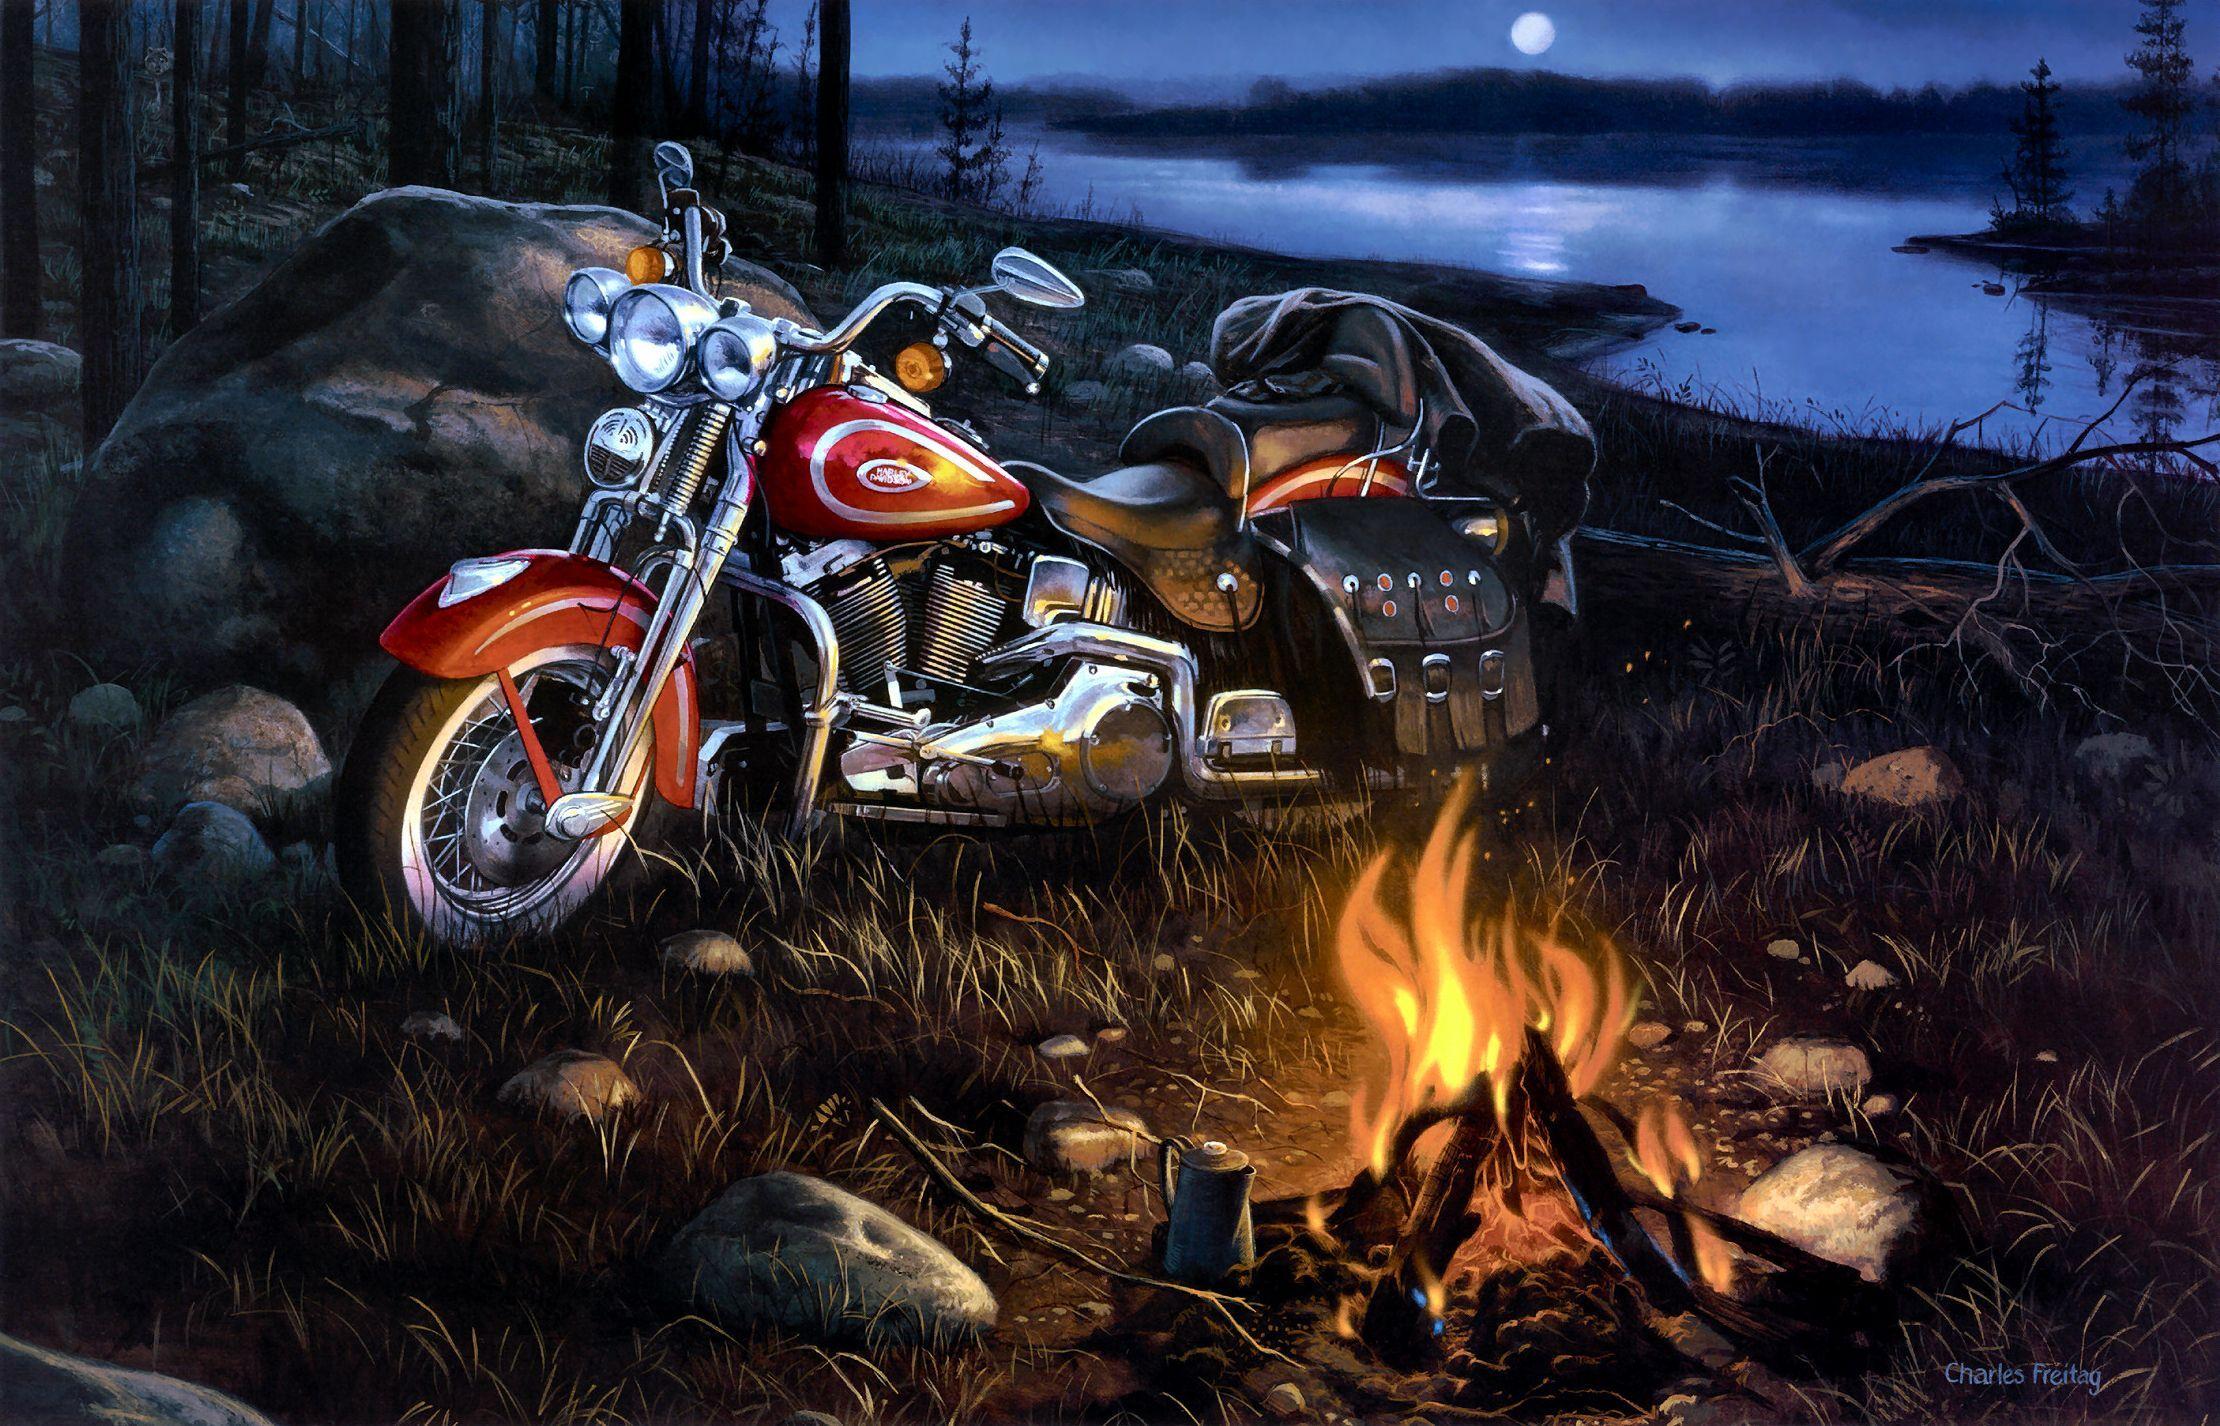 motorcycle harley street glide wallpaper - photo #45